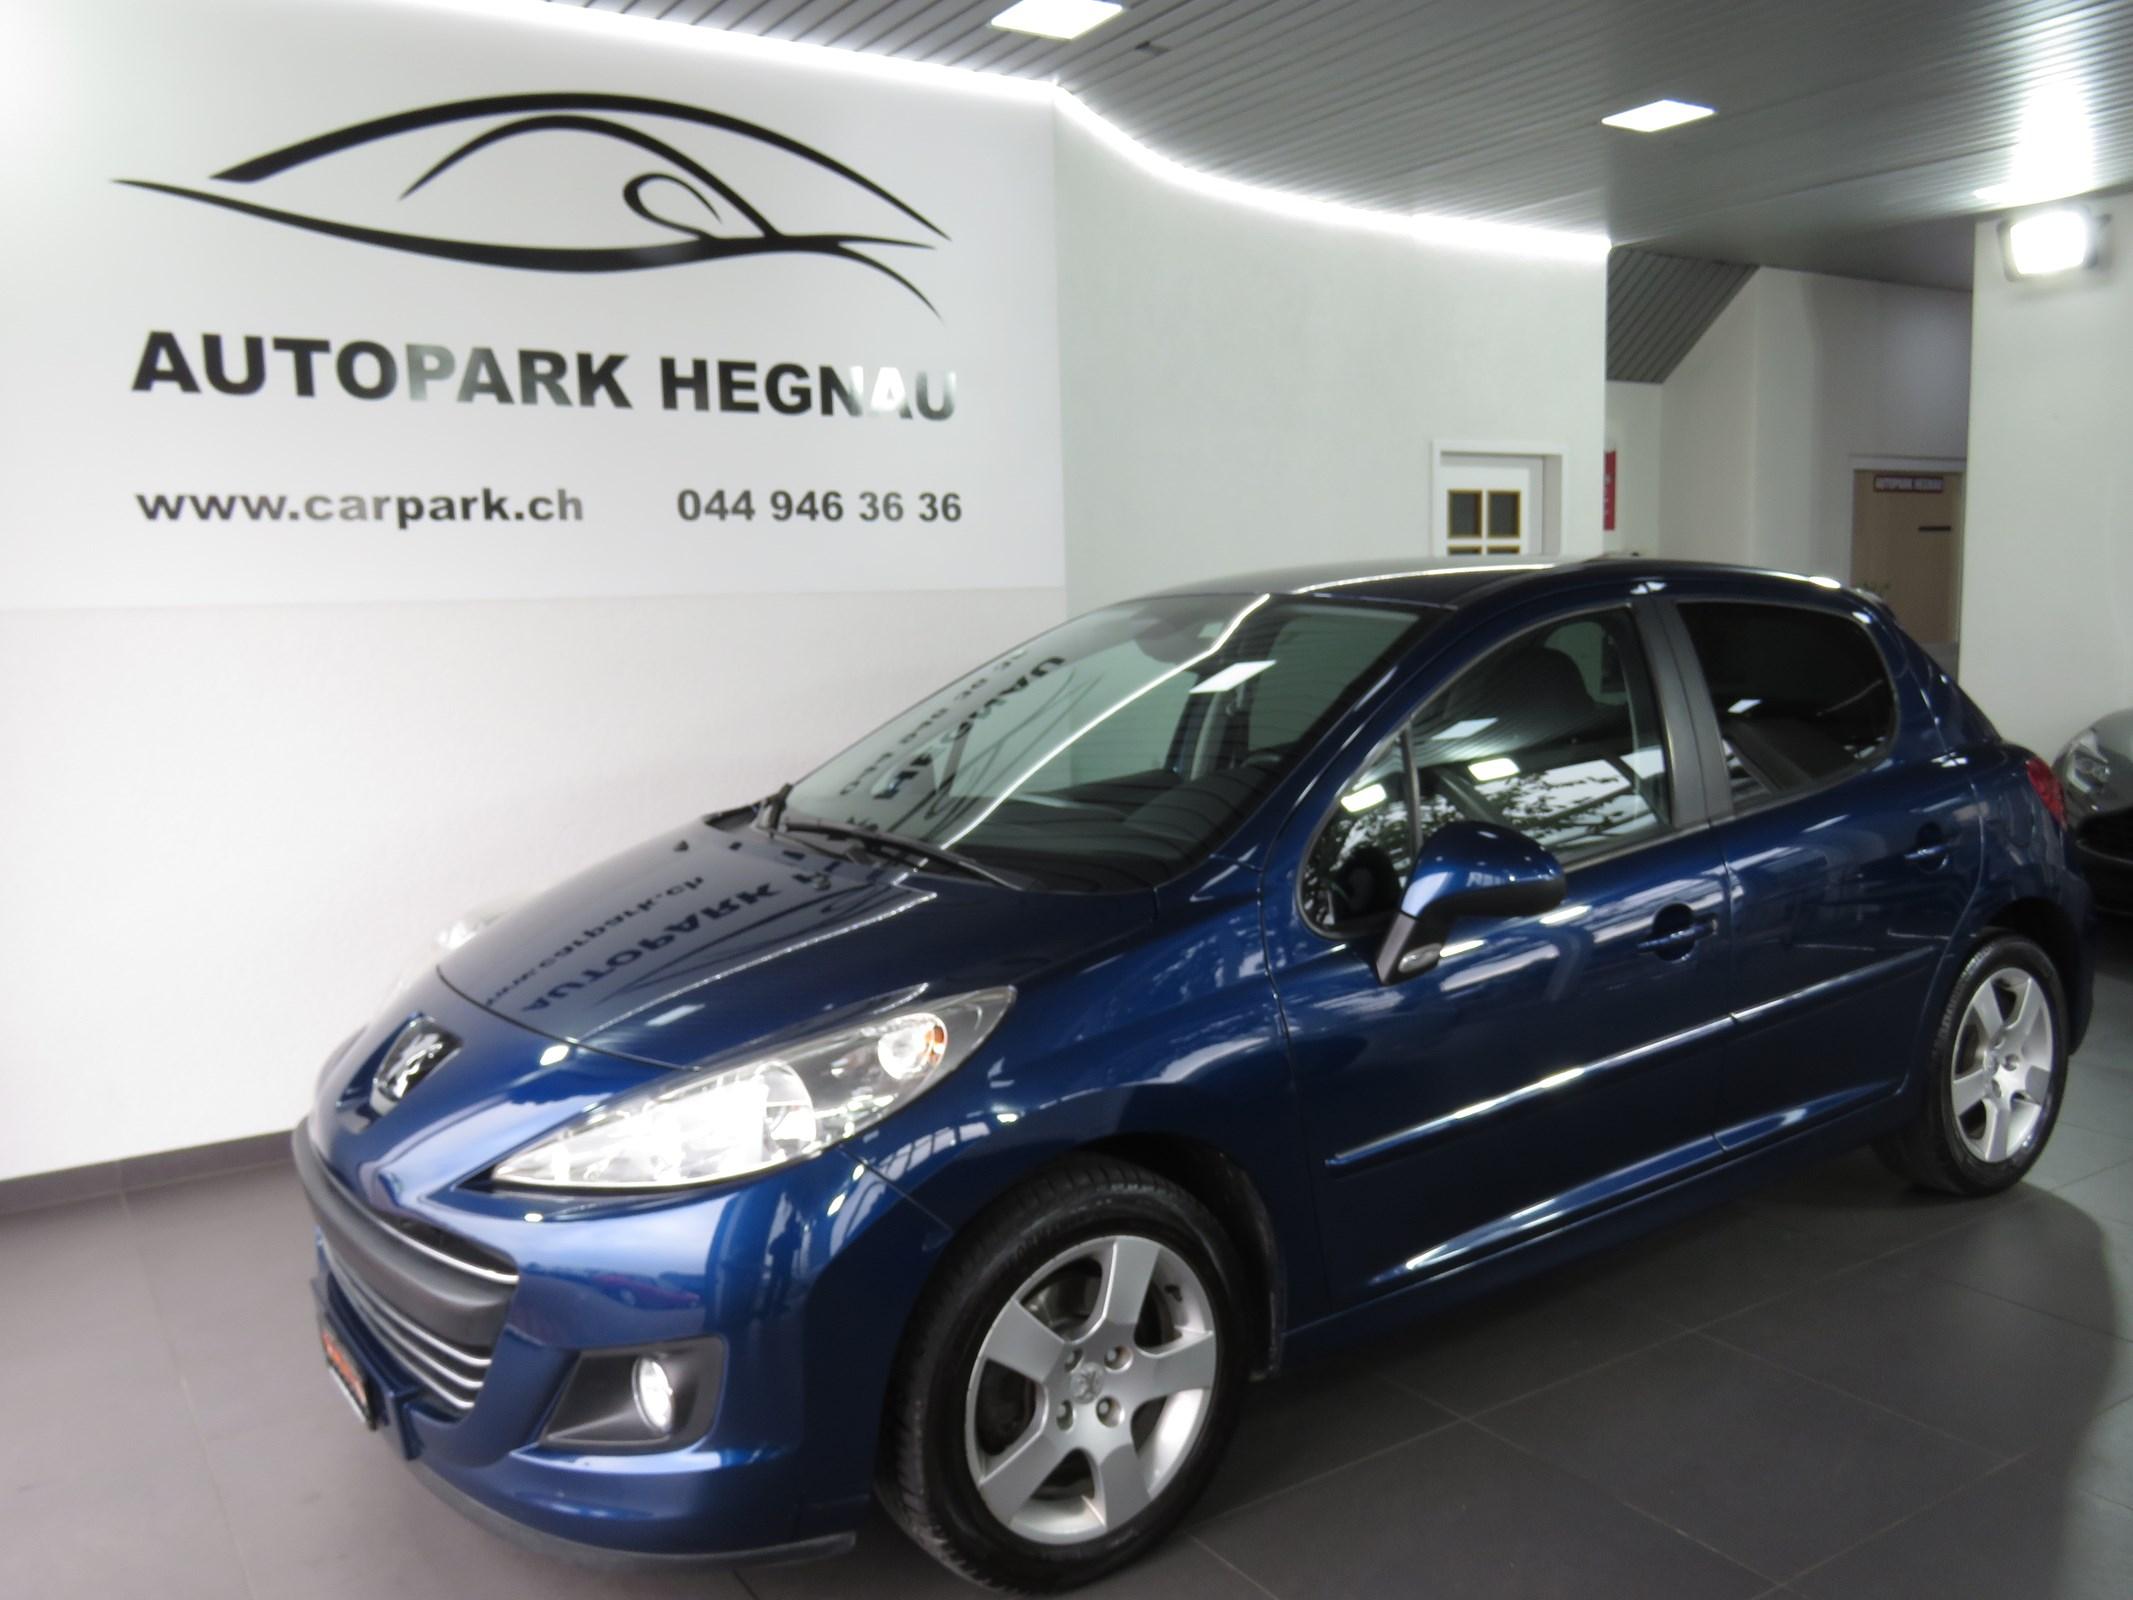 saloon Peugeot 207 1.6 16V Allure Automatic